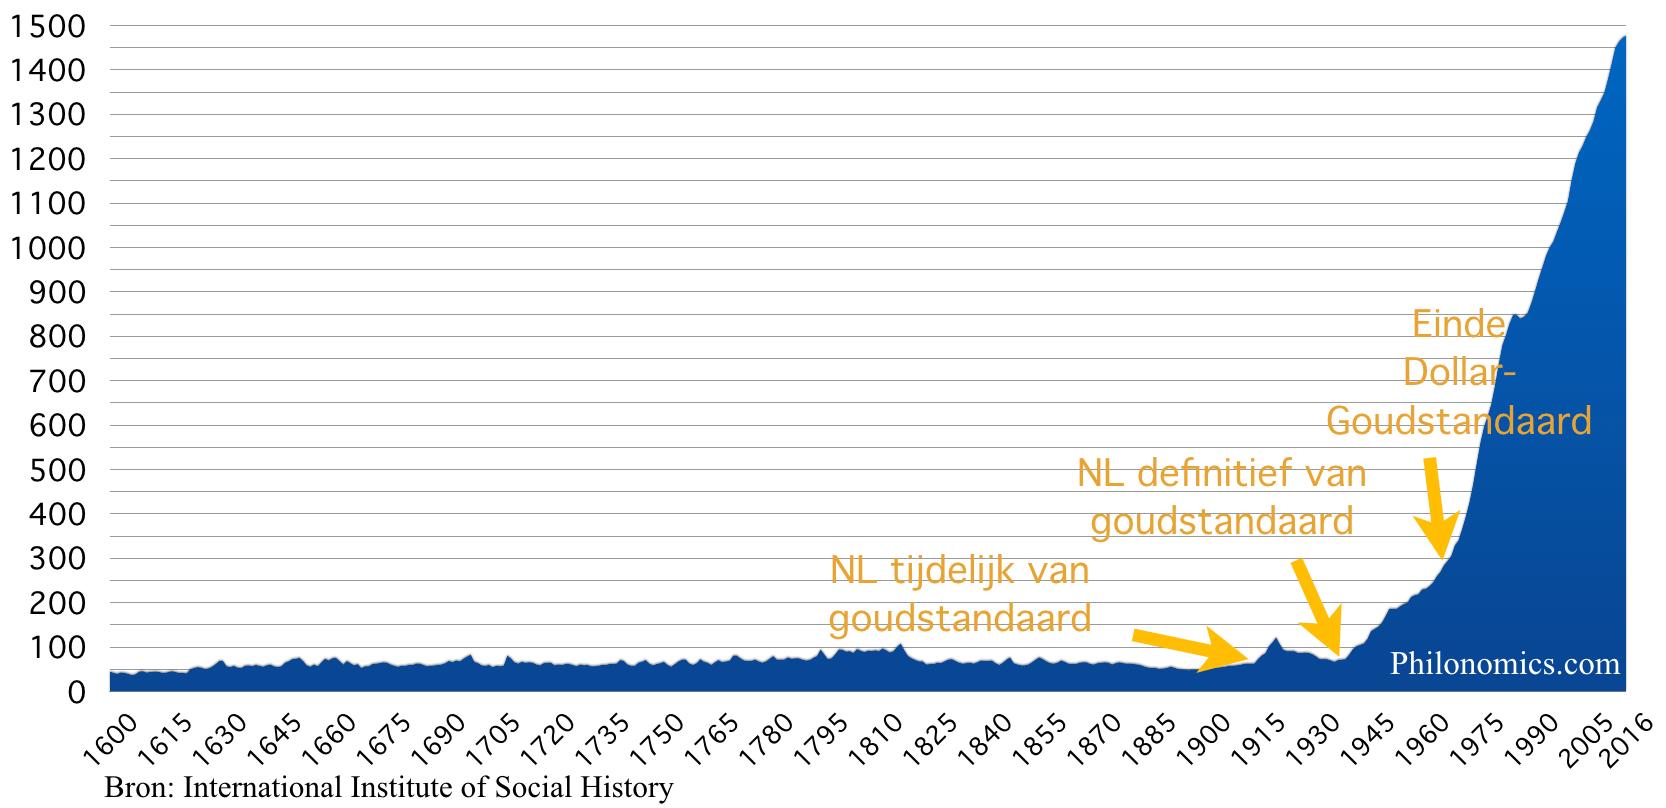 Consumentenprijsindex Nederland (1900=50) 1600-2016